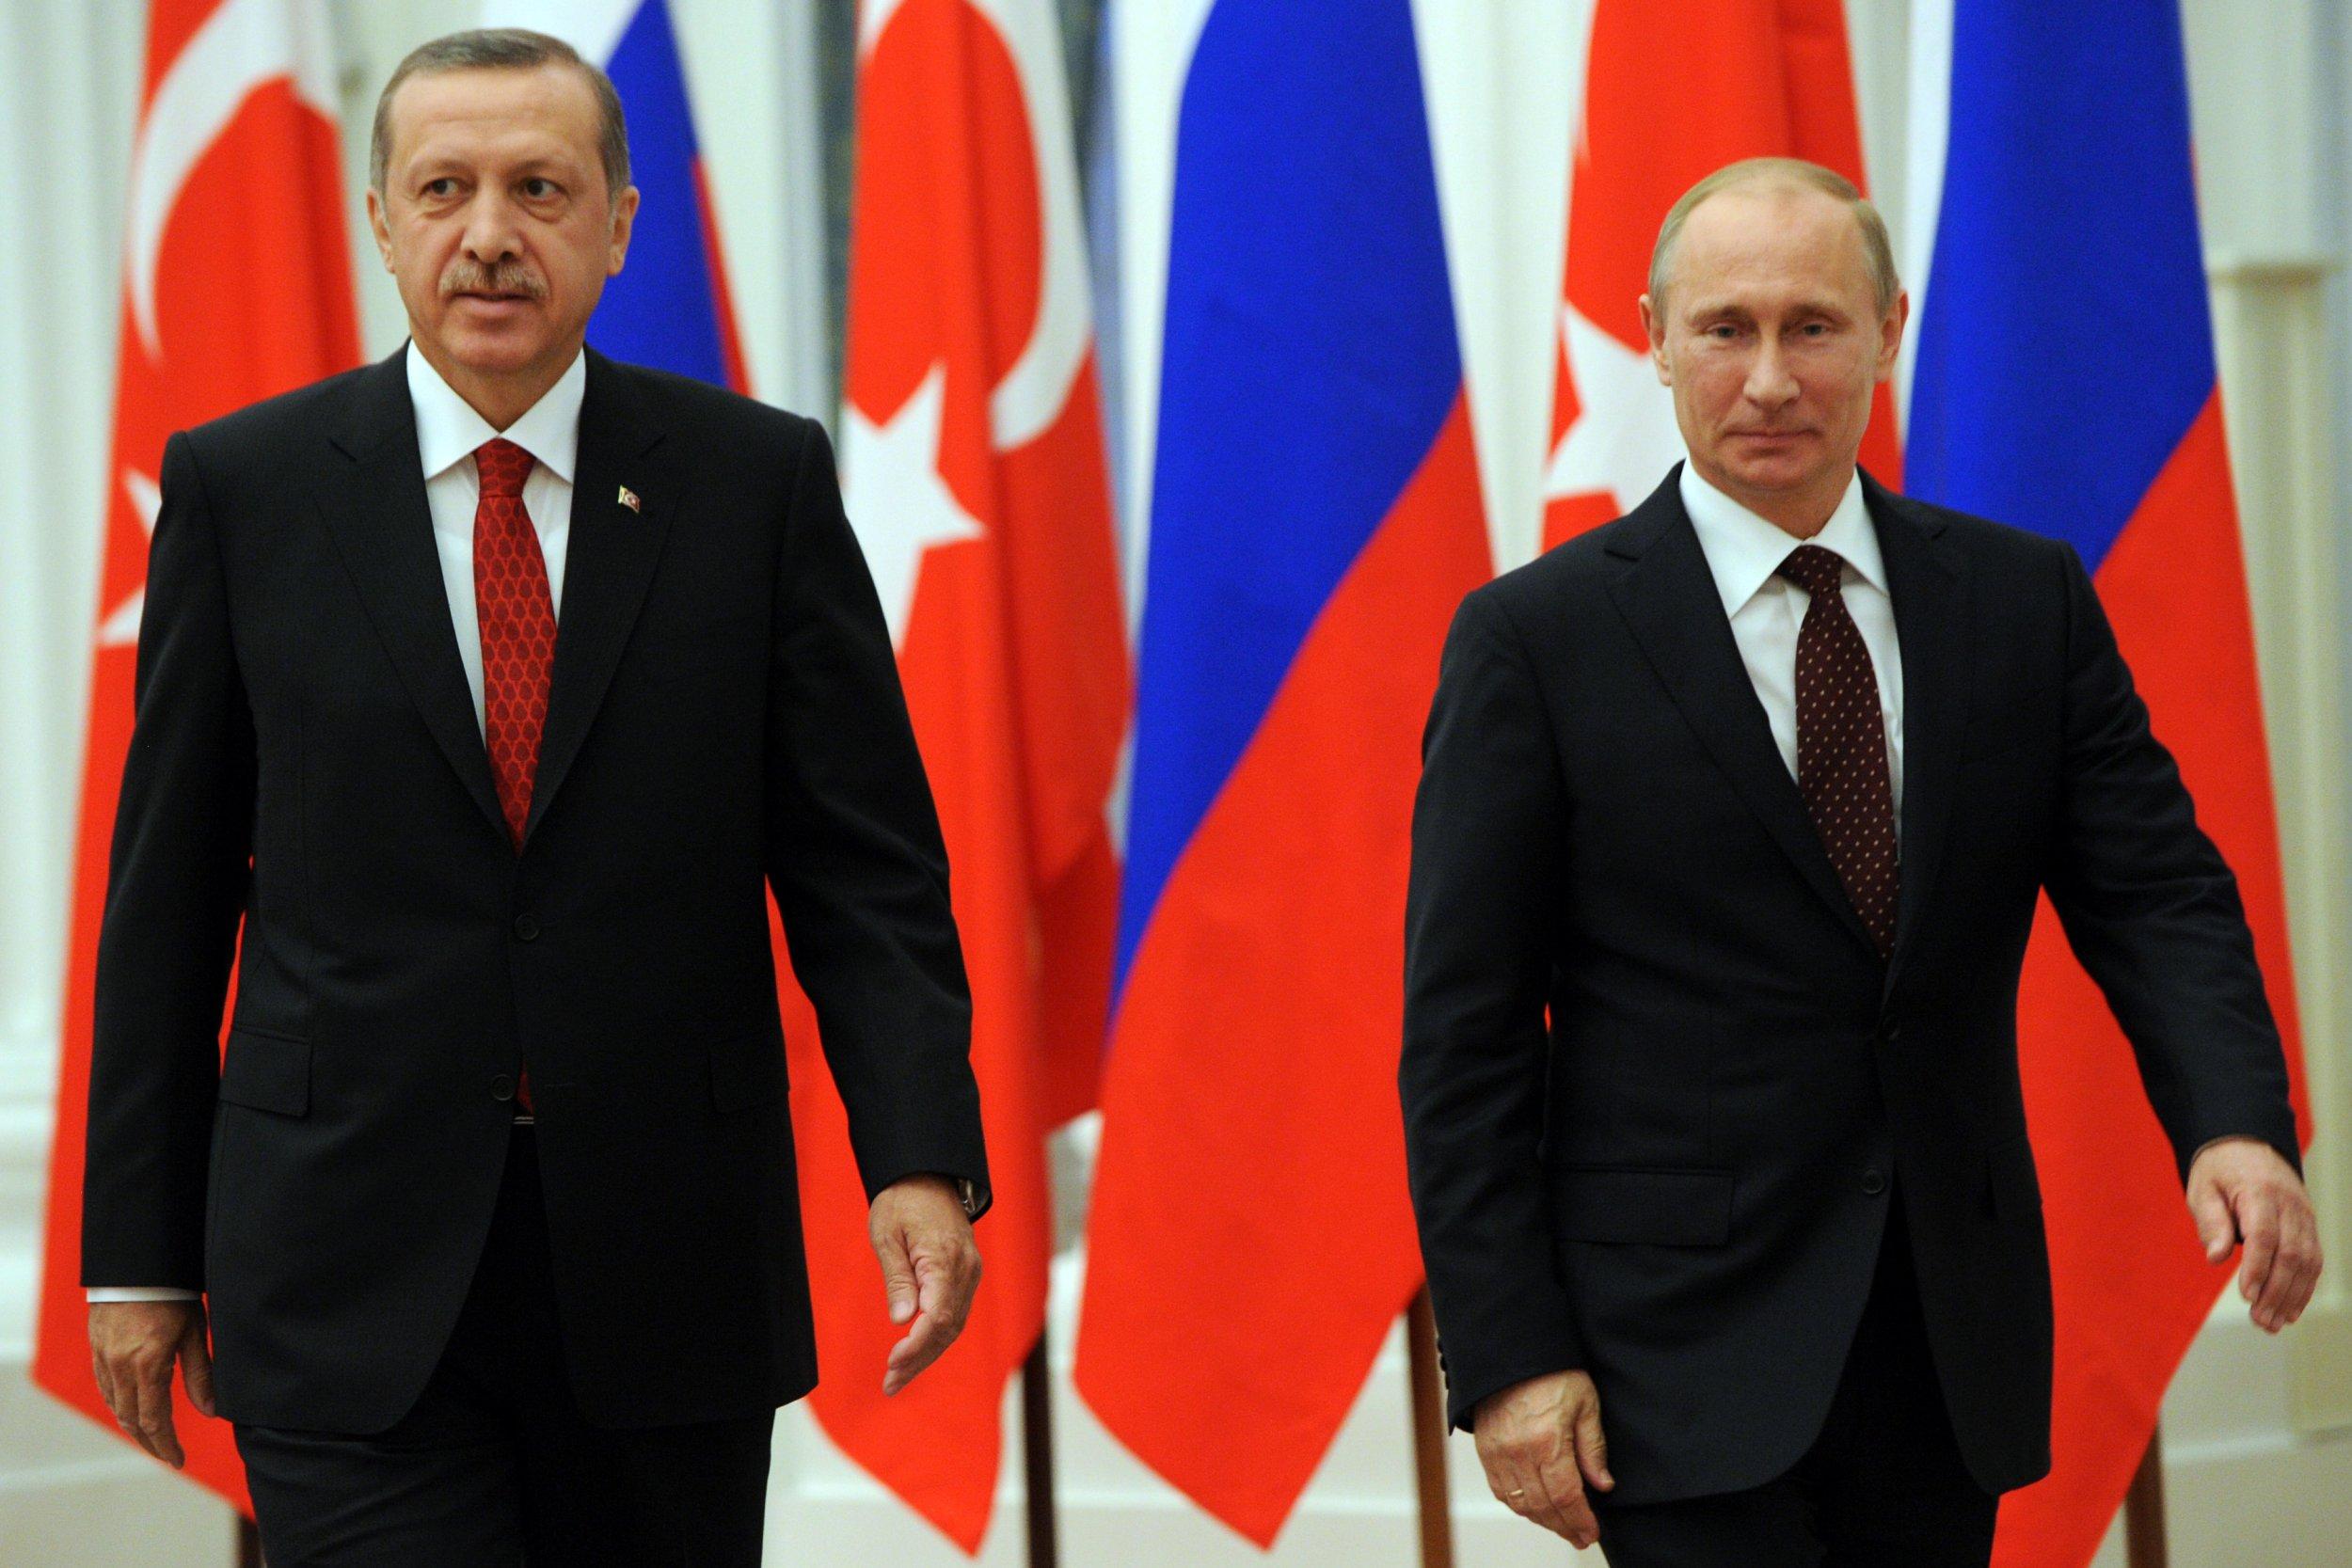 Turkish President Erdogan and Russian President Putin